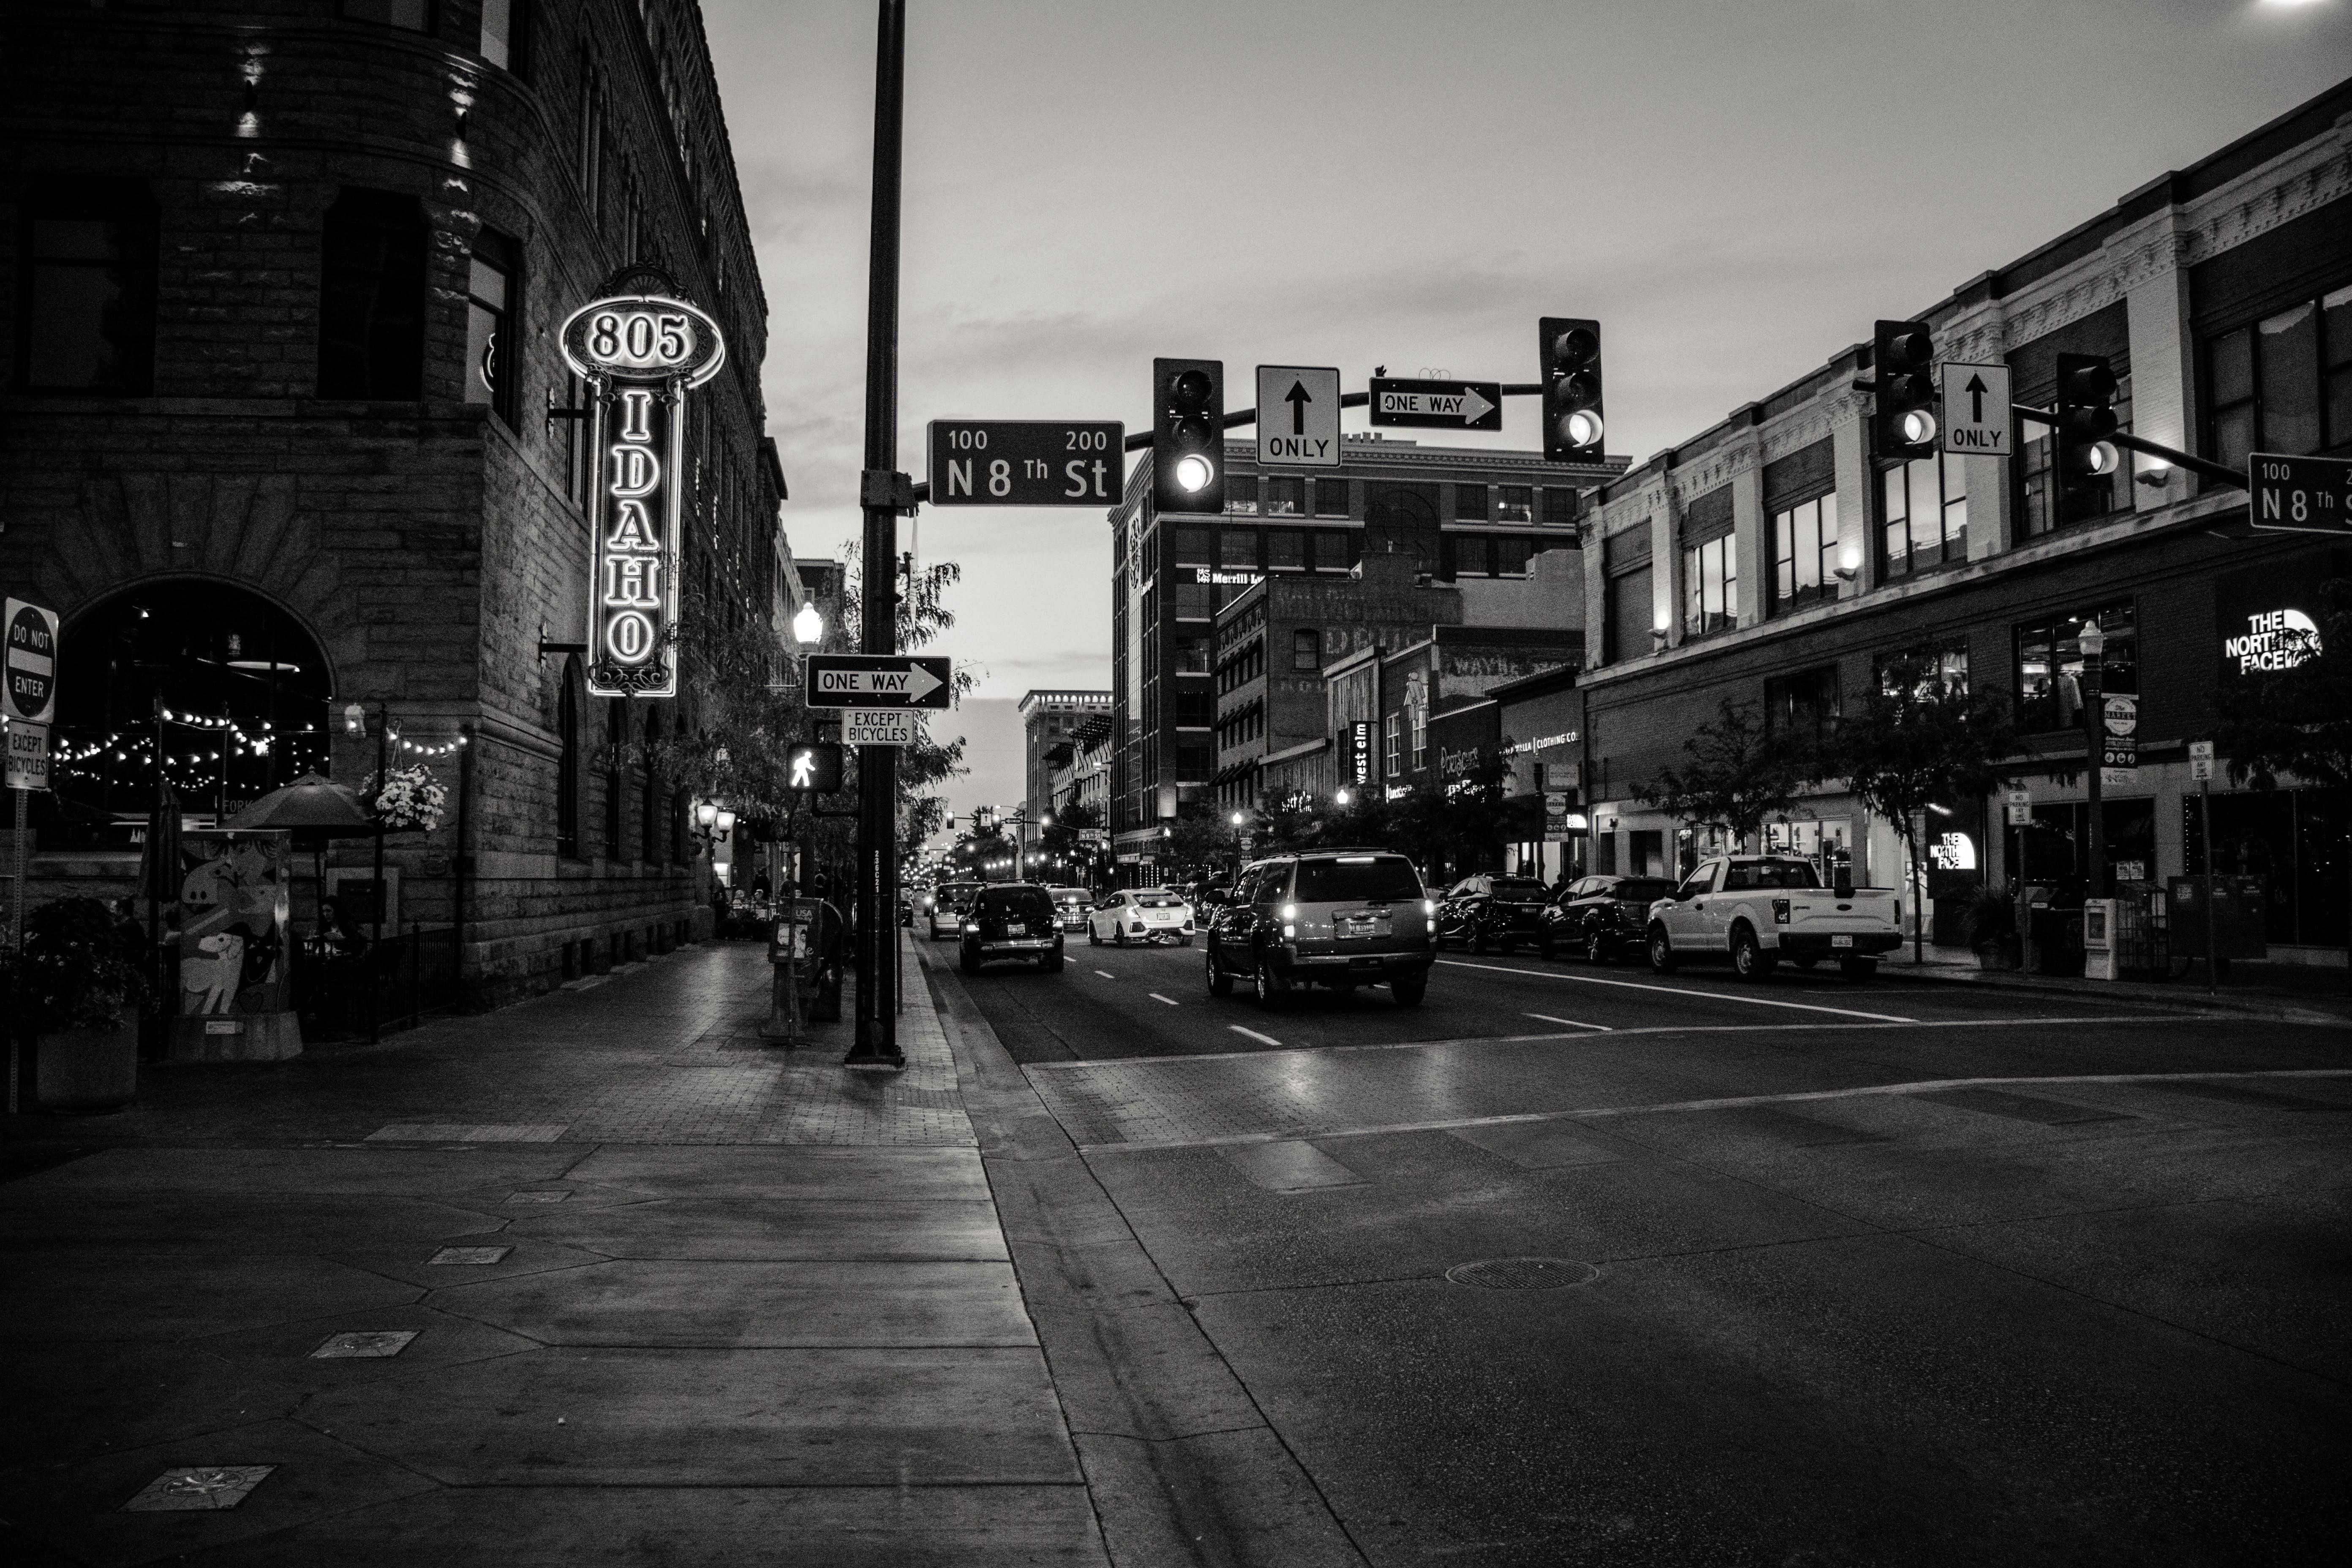 Grayscale Street Photo